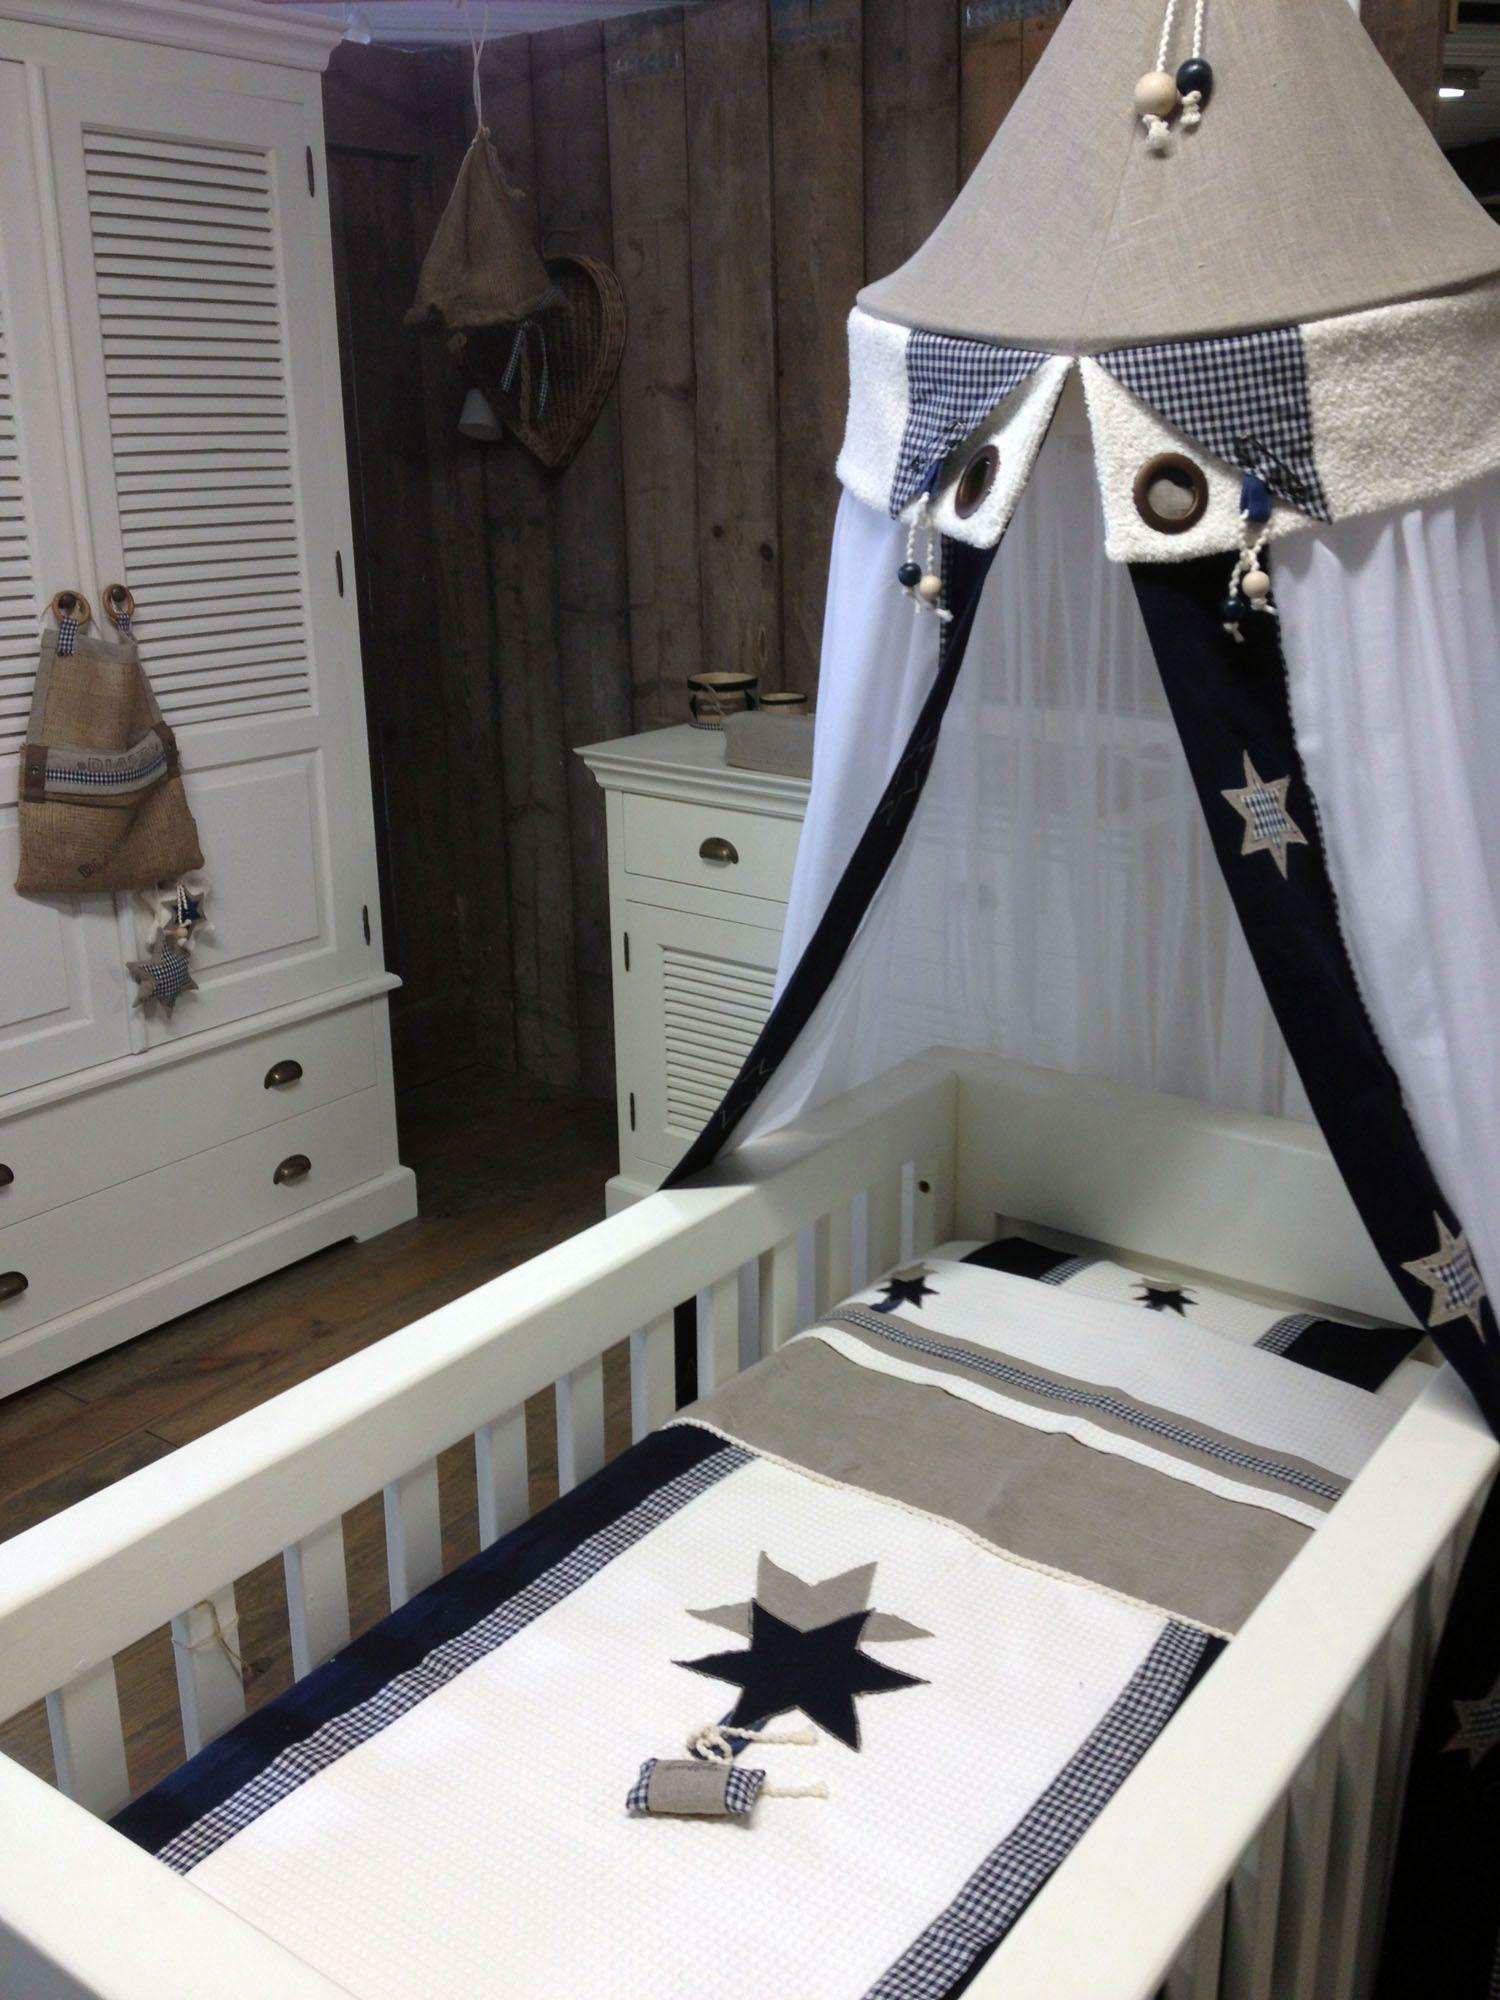 Complete Aankleding Babykamer.Babybed Met Klamboe En Lakentje In Babykamer Donkerblauw Complete